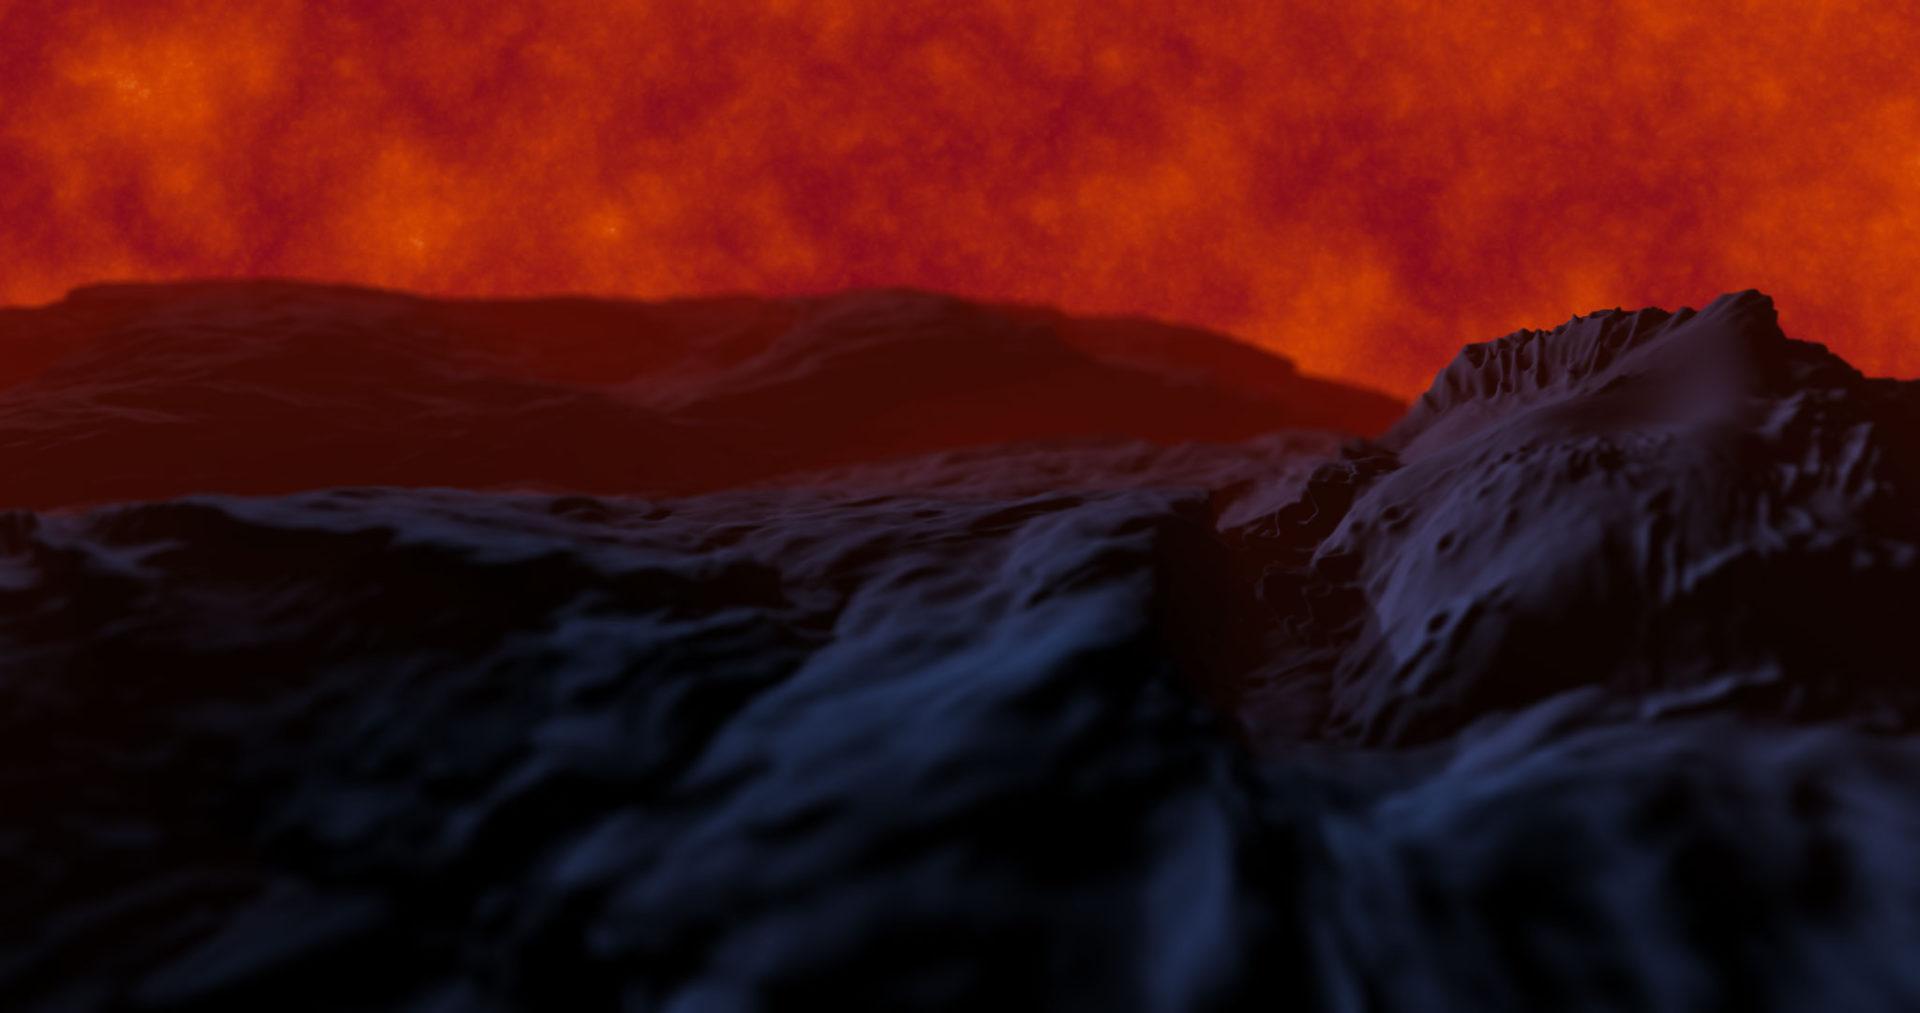 Lava sky background